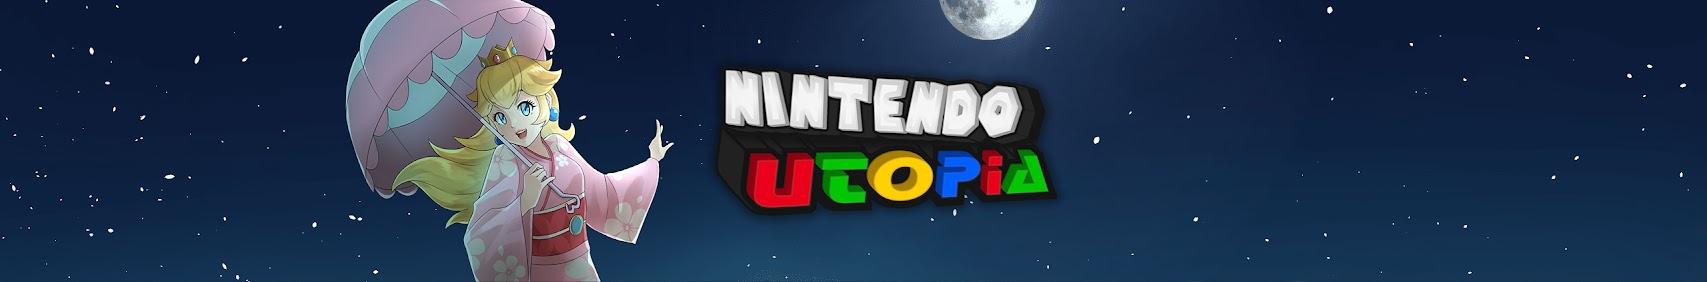 Nintendo Utopia